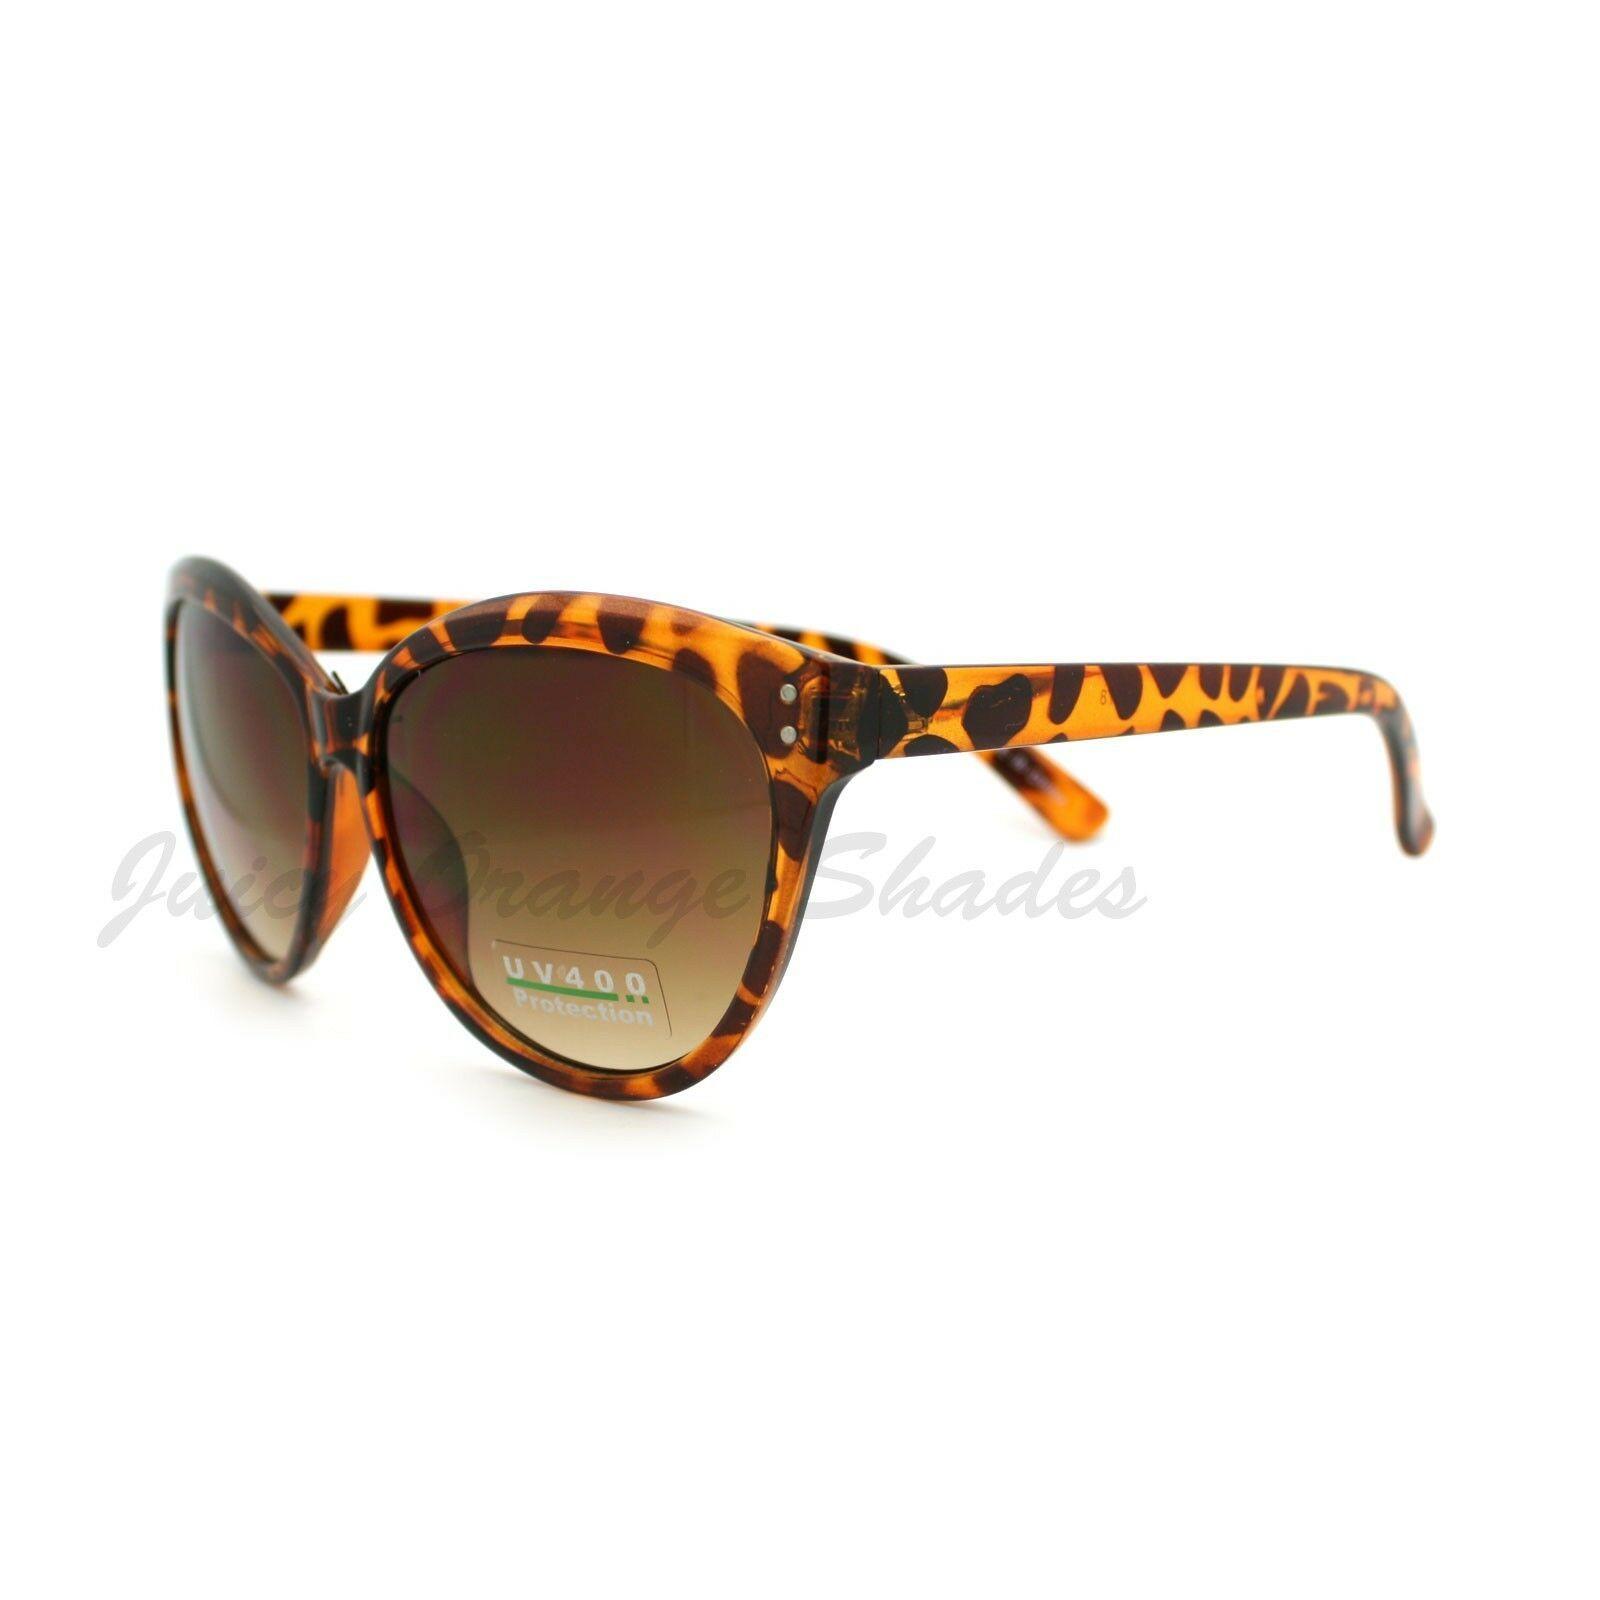 Women's Round Cateye Sunglasses Classic Casual Fashion Shades